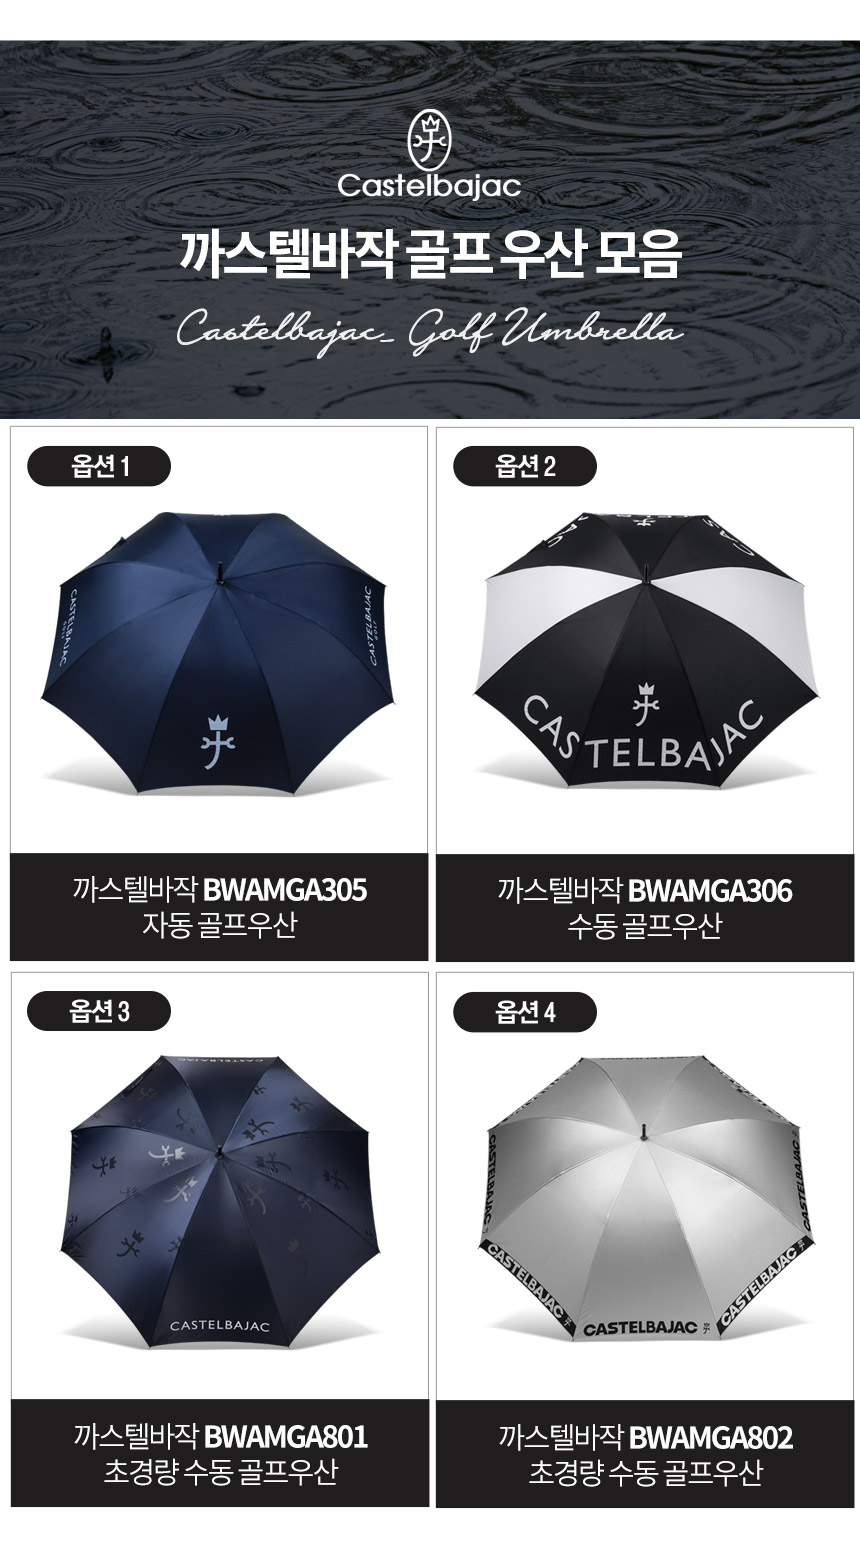 castelbajac_umbrella_list_21.jpg